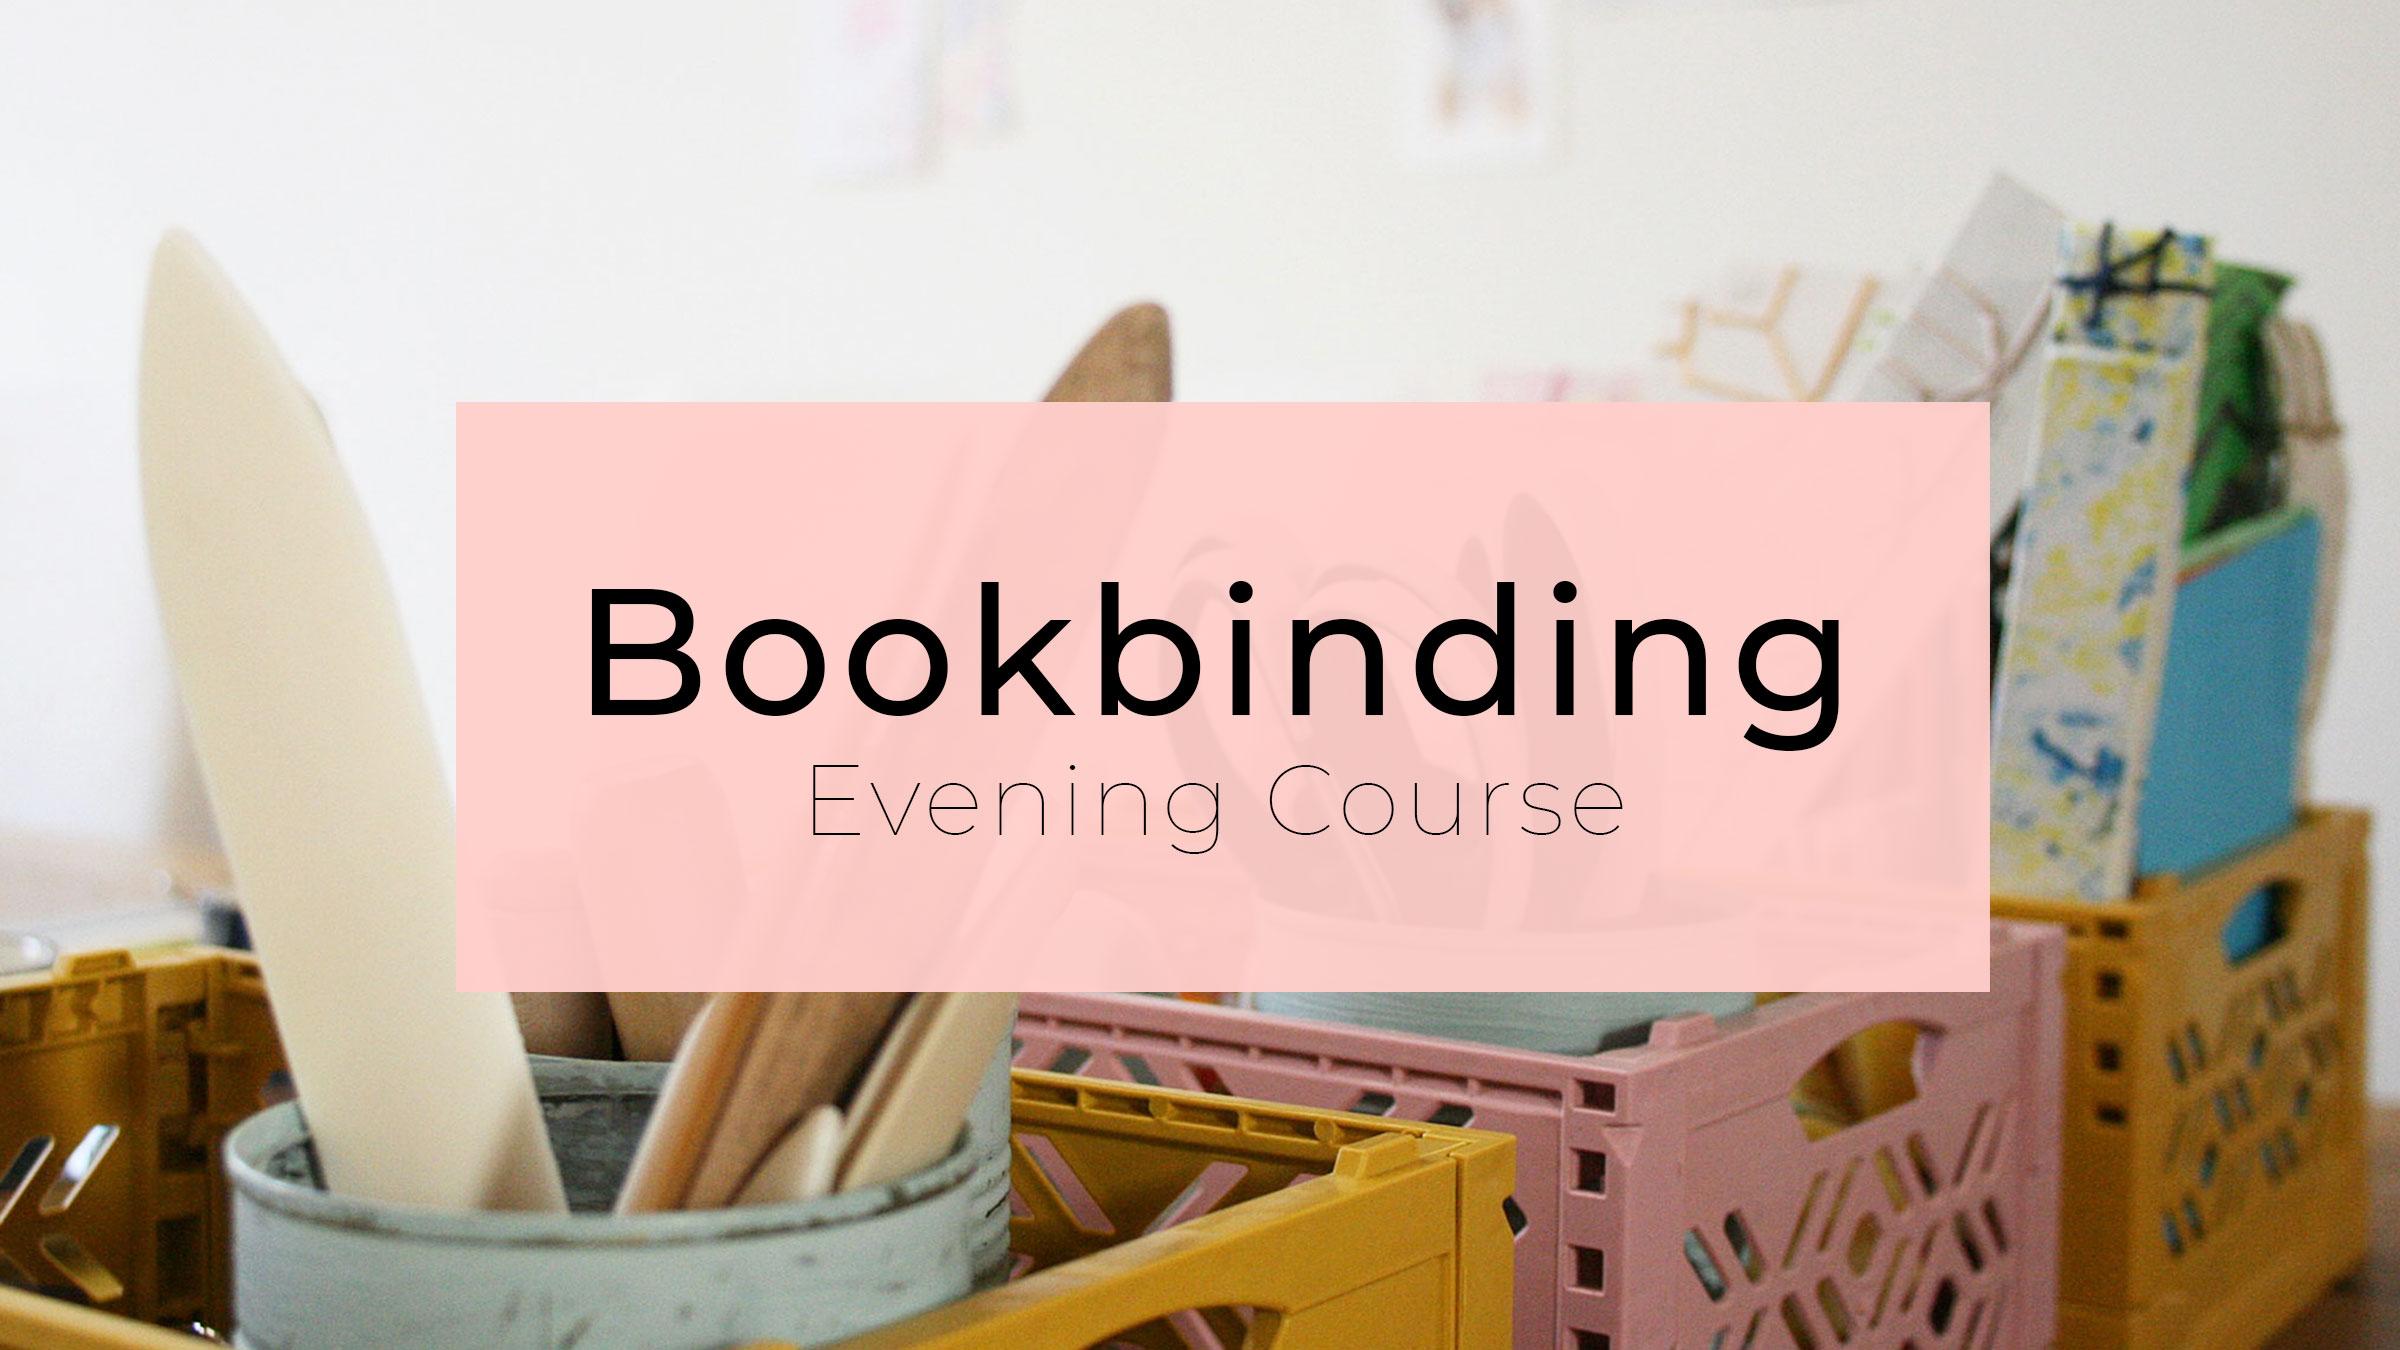 bookbinding-course-munich-indigocraftroom-0